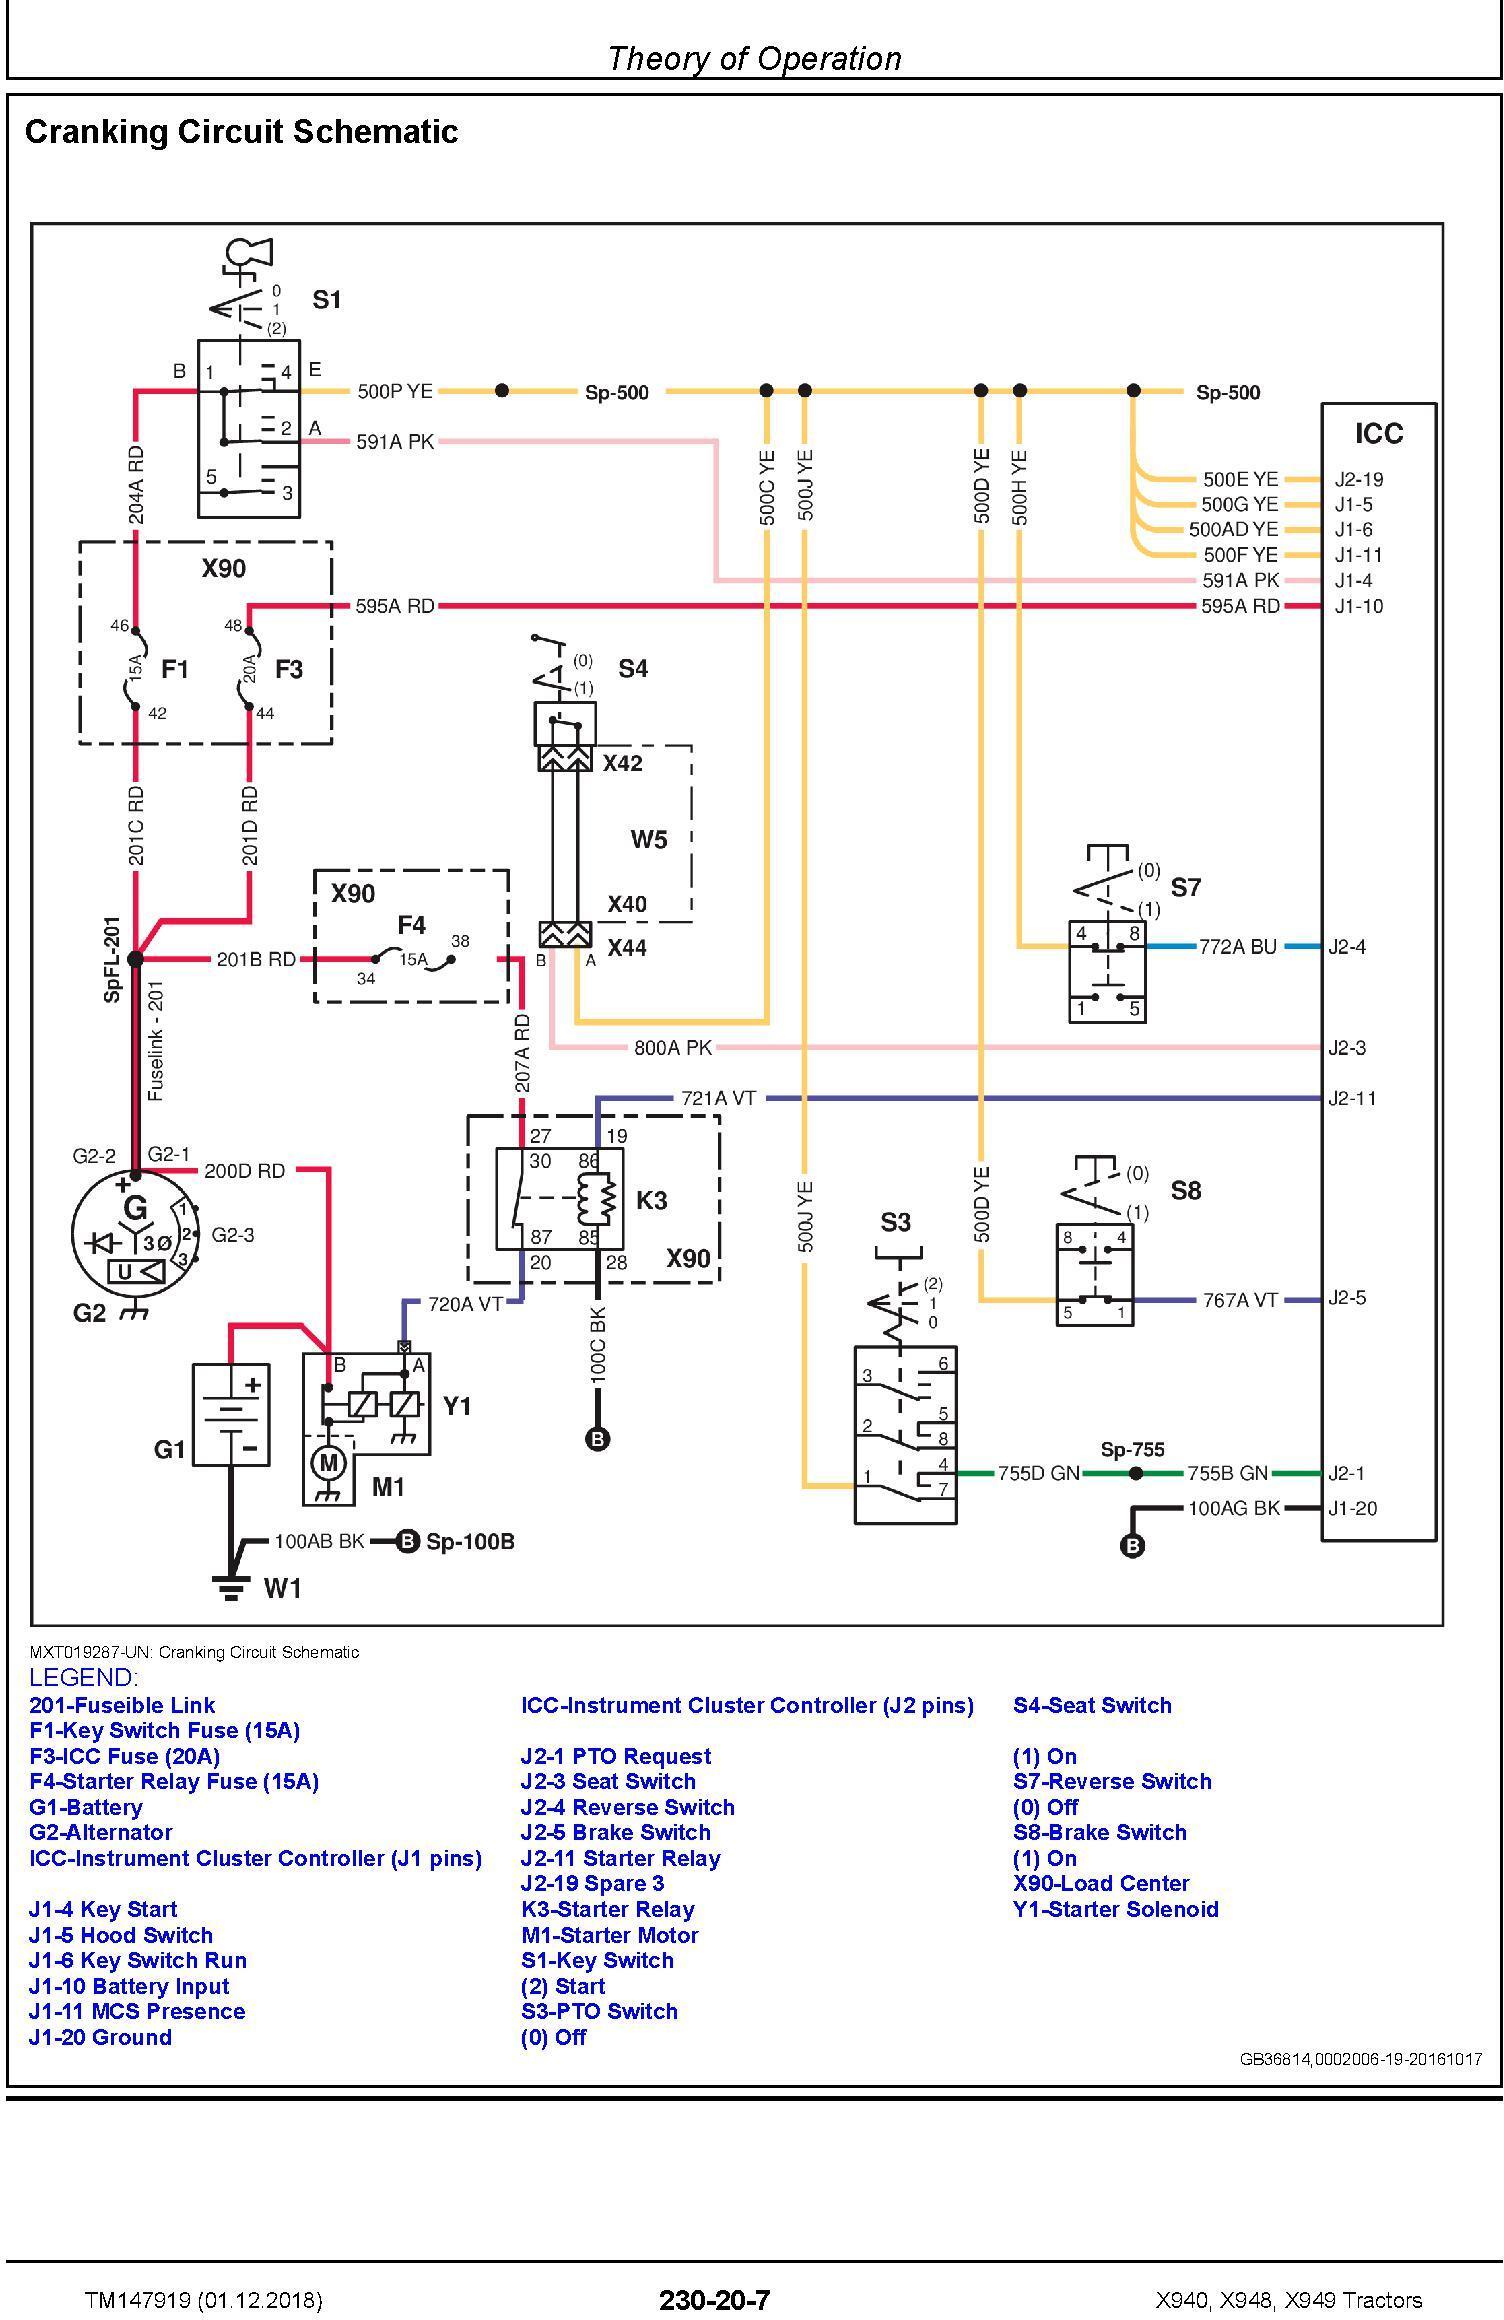 John Deere X940, X948, X949 Compact Utility Tractors (SN. 060001-) Technical Manual (TM147919) - 2